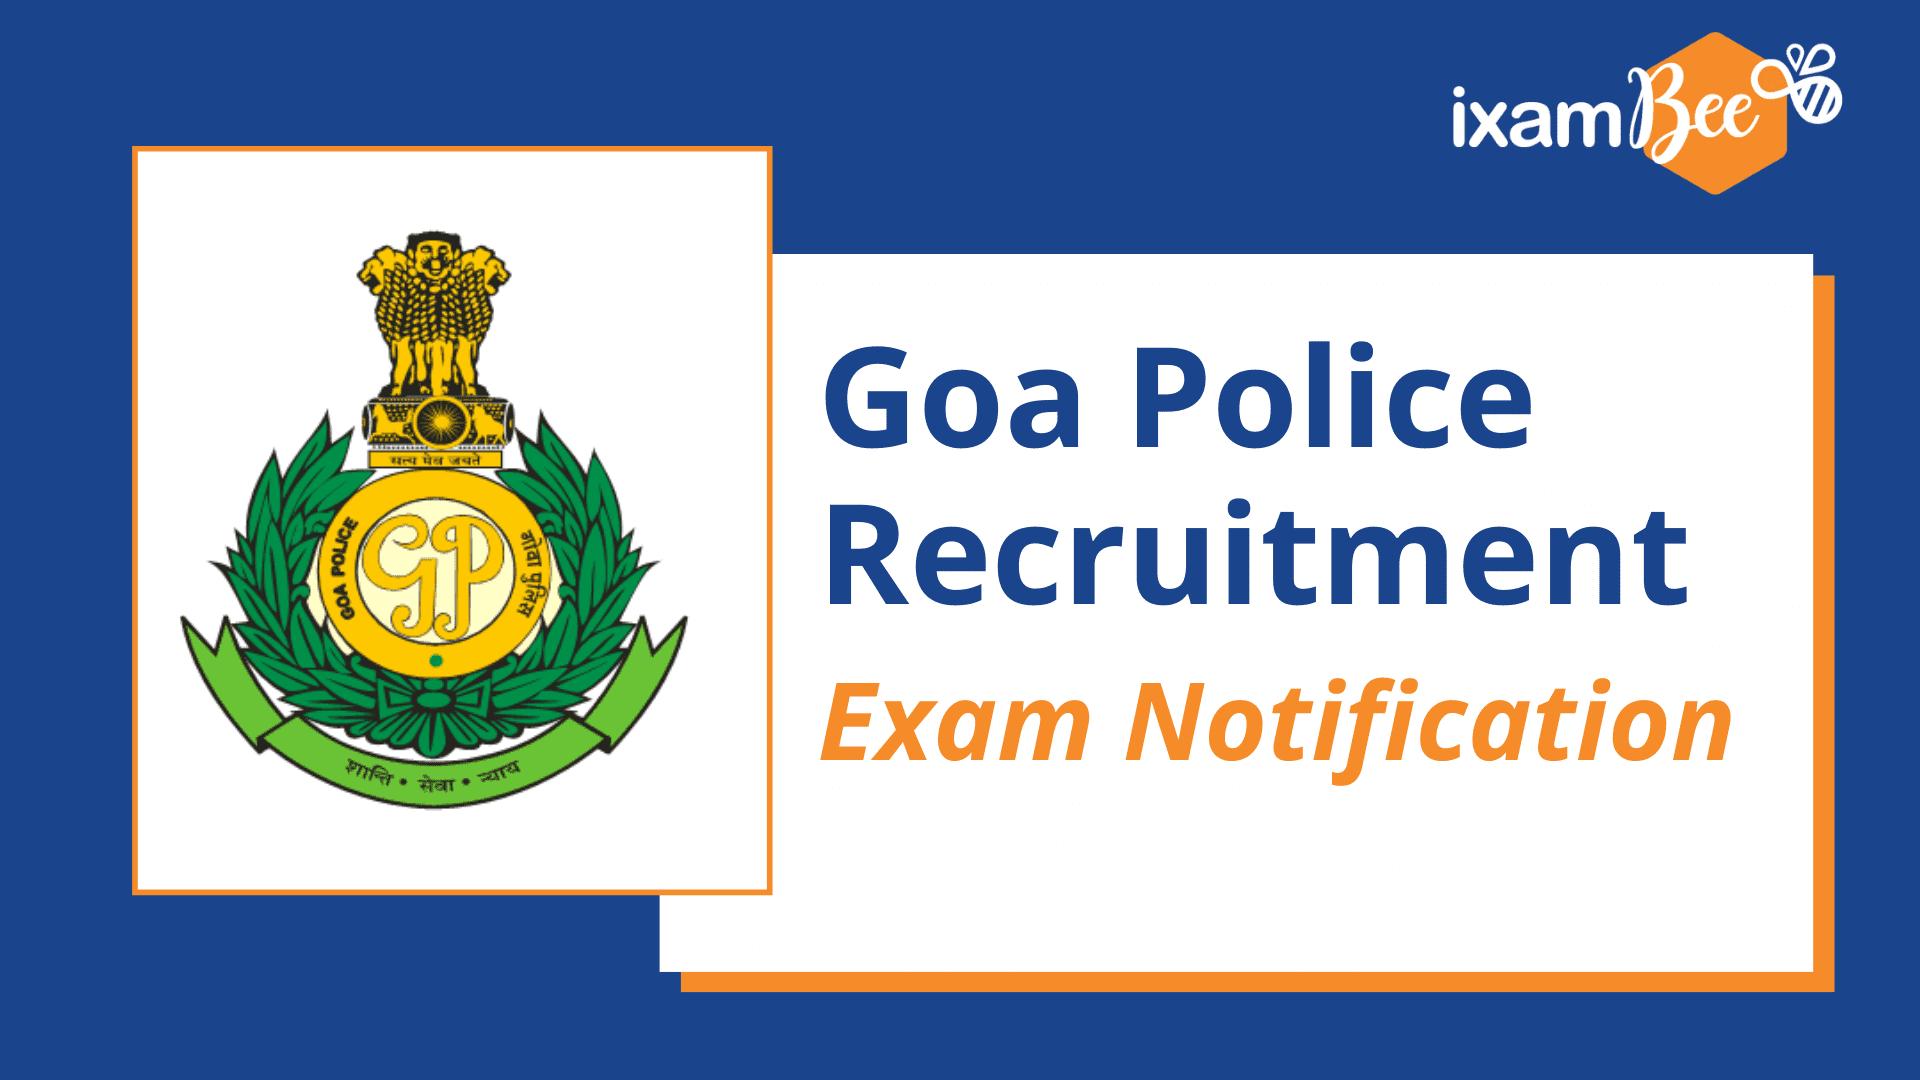 Goa Police Recruitment Notification